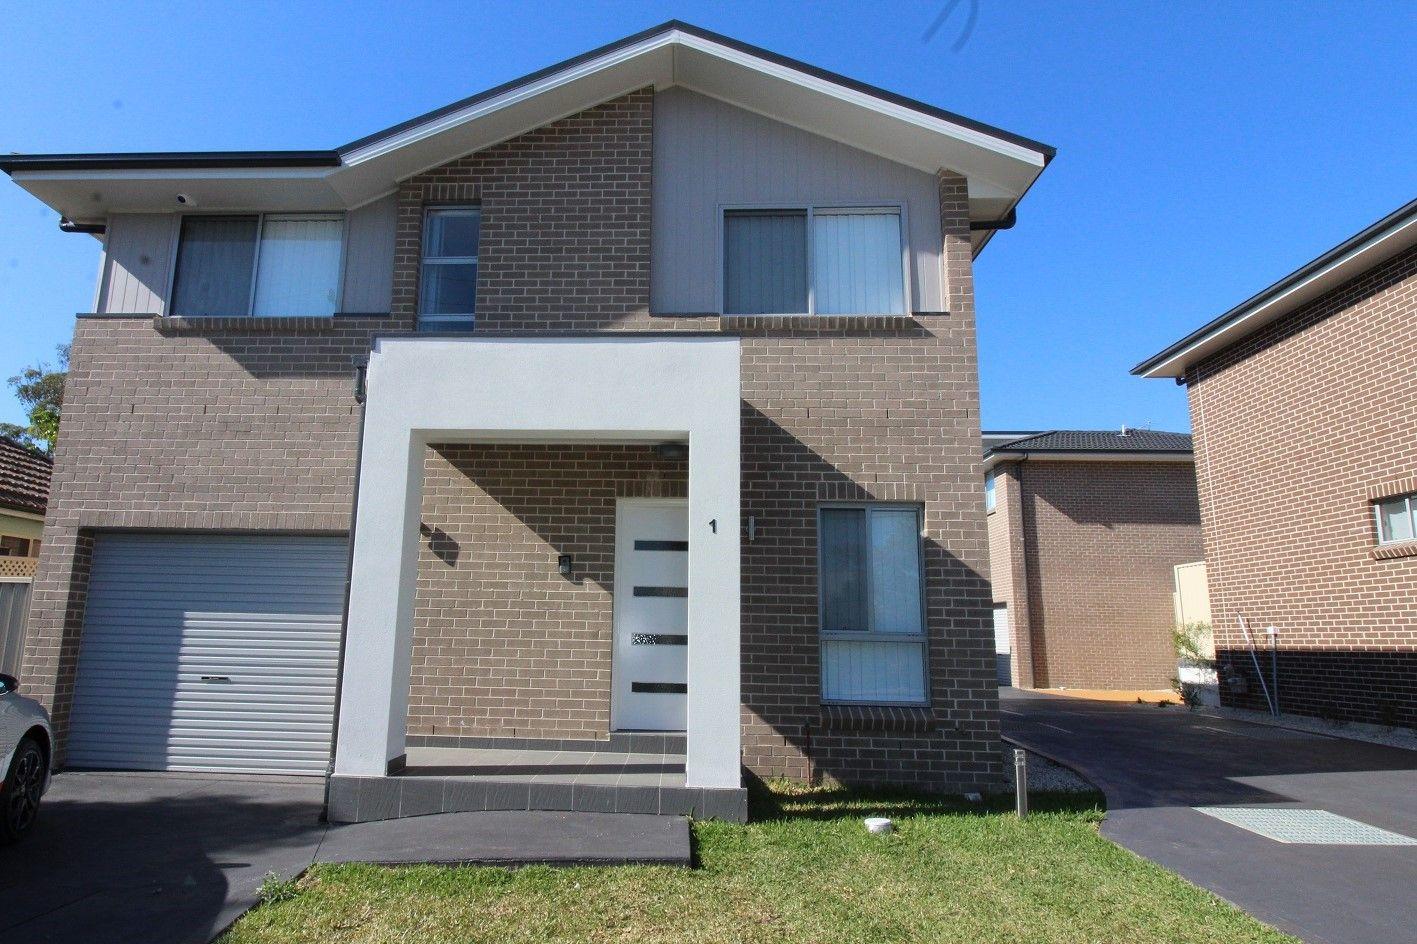 1/11 Booreea Street, Blacktown NSW 2148, Image 0